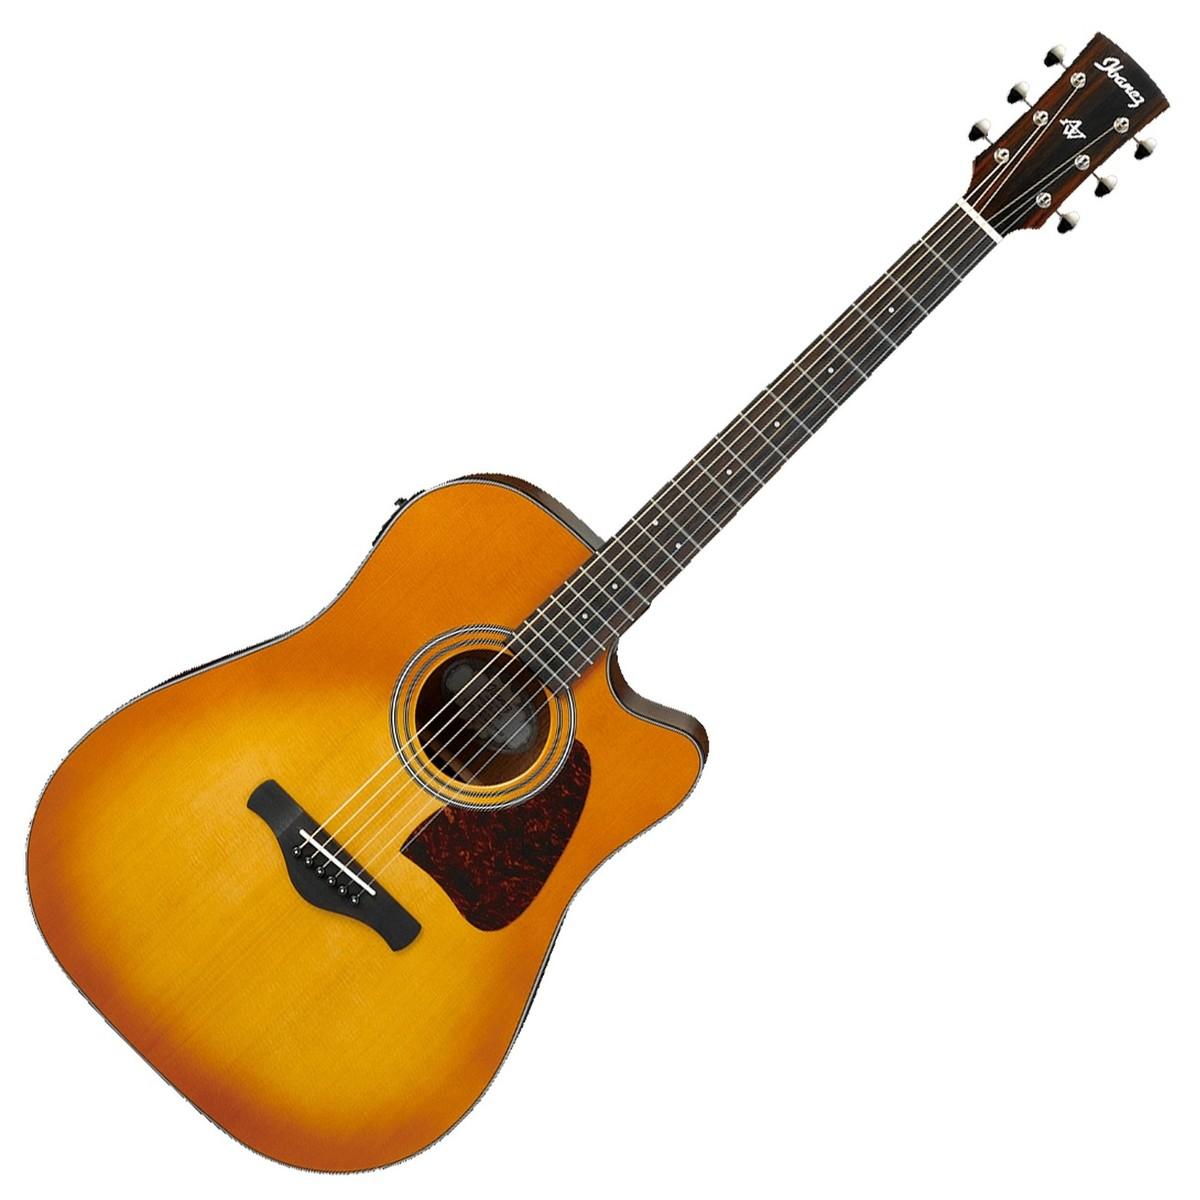 Image of Ibanez AW400CE Electro Acoustic Guitar Light Violin Sunburst Gloss